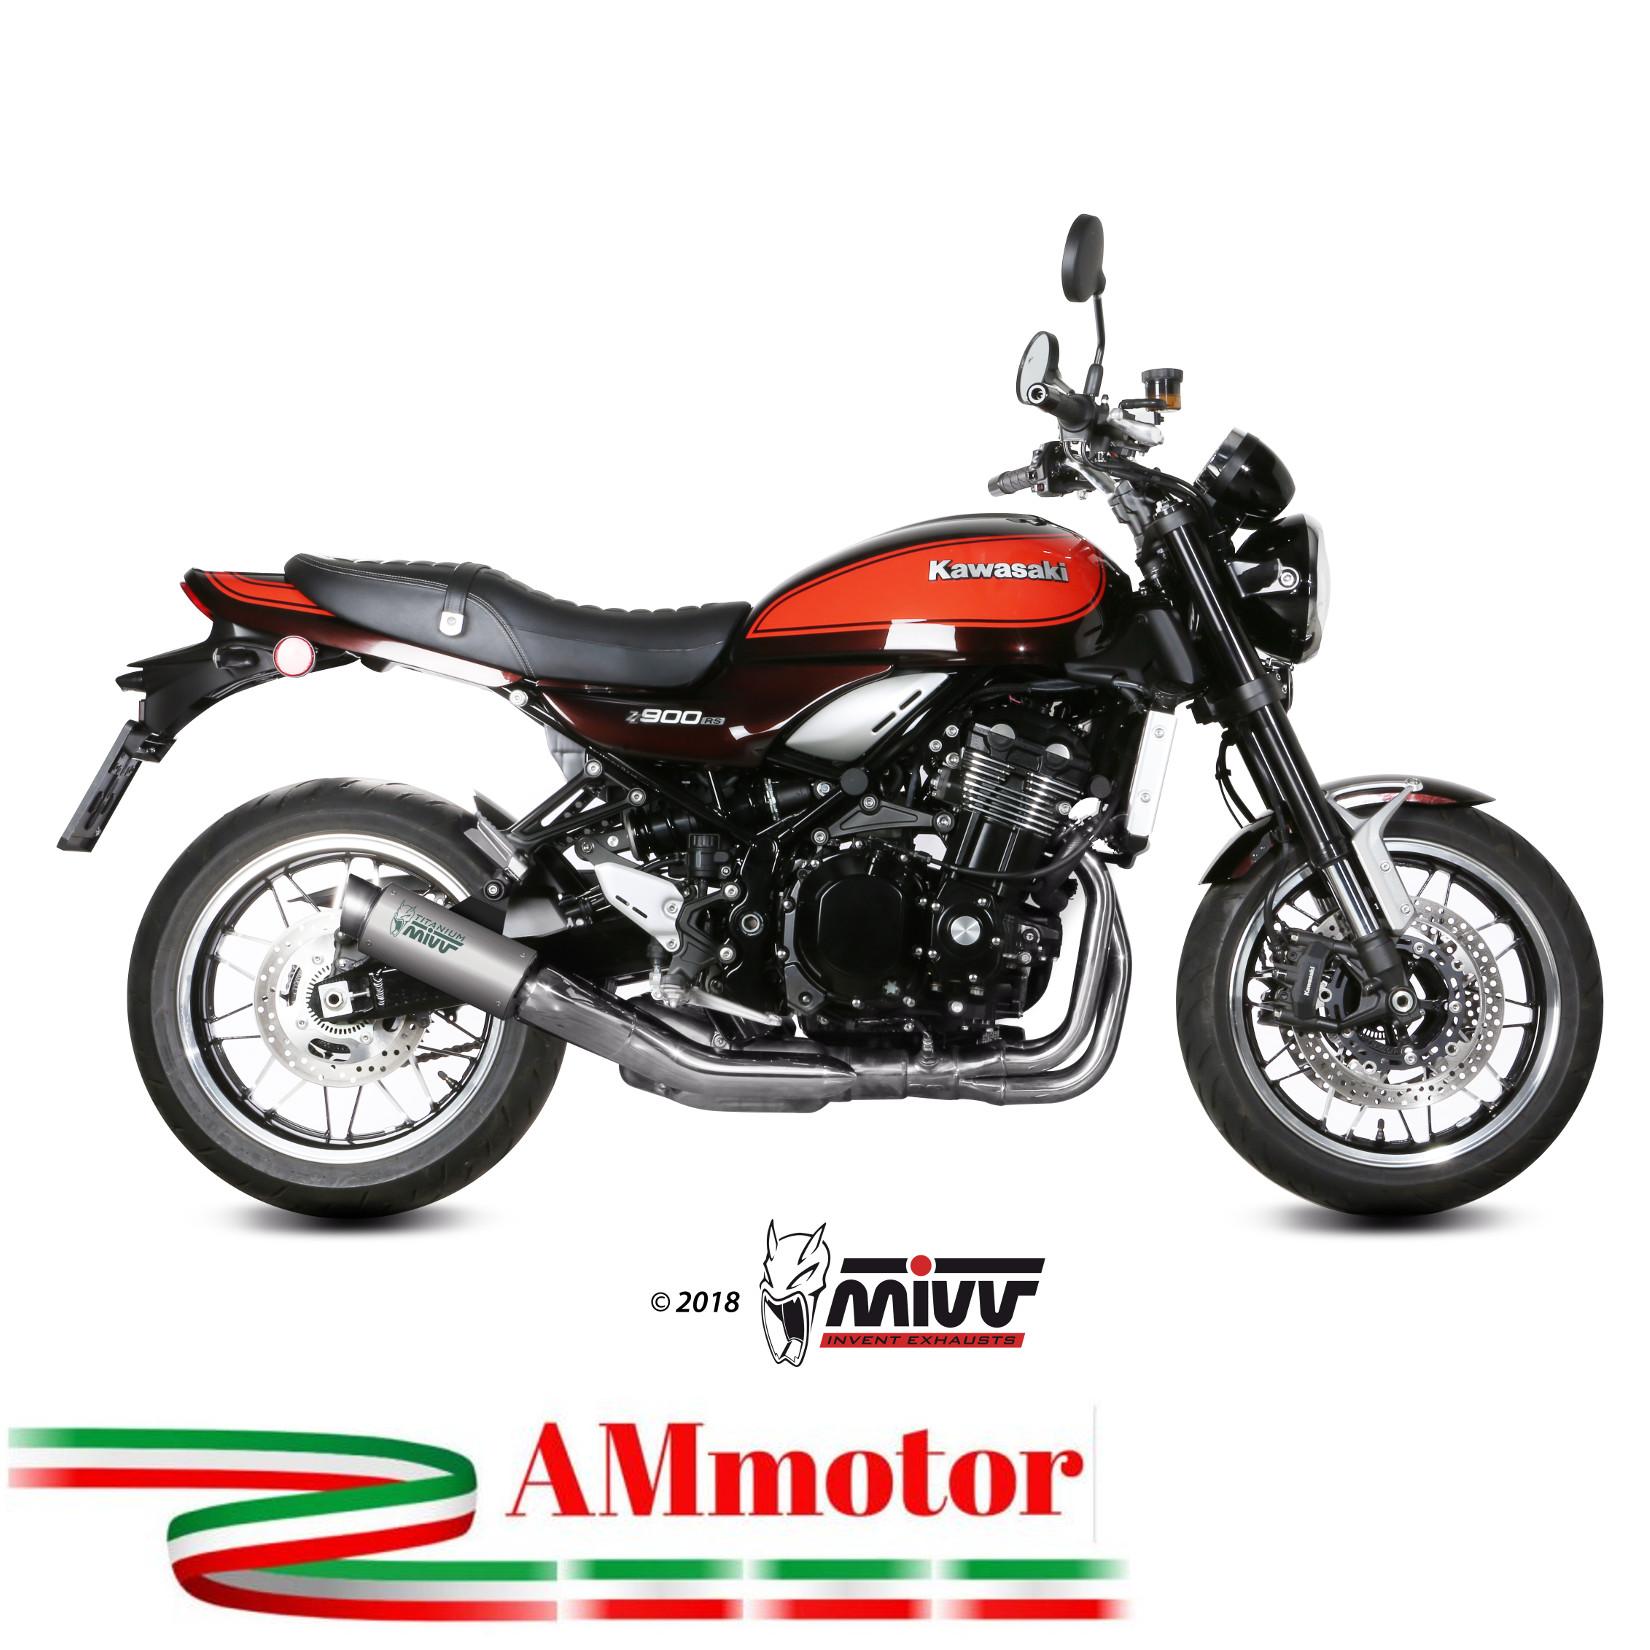 Details about Mivv Kawasaki Z 900 Rs 2018 18 Exhaust Gp Pro Titanium  Motorcycle